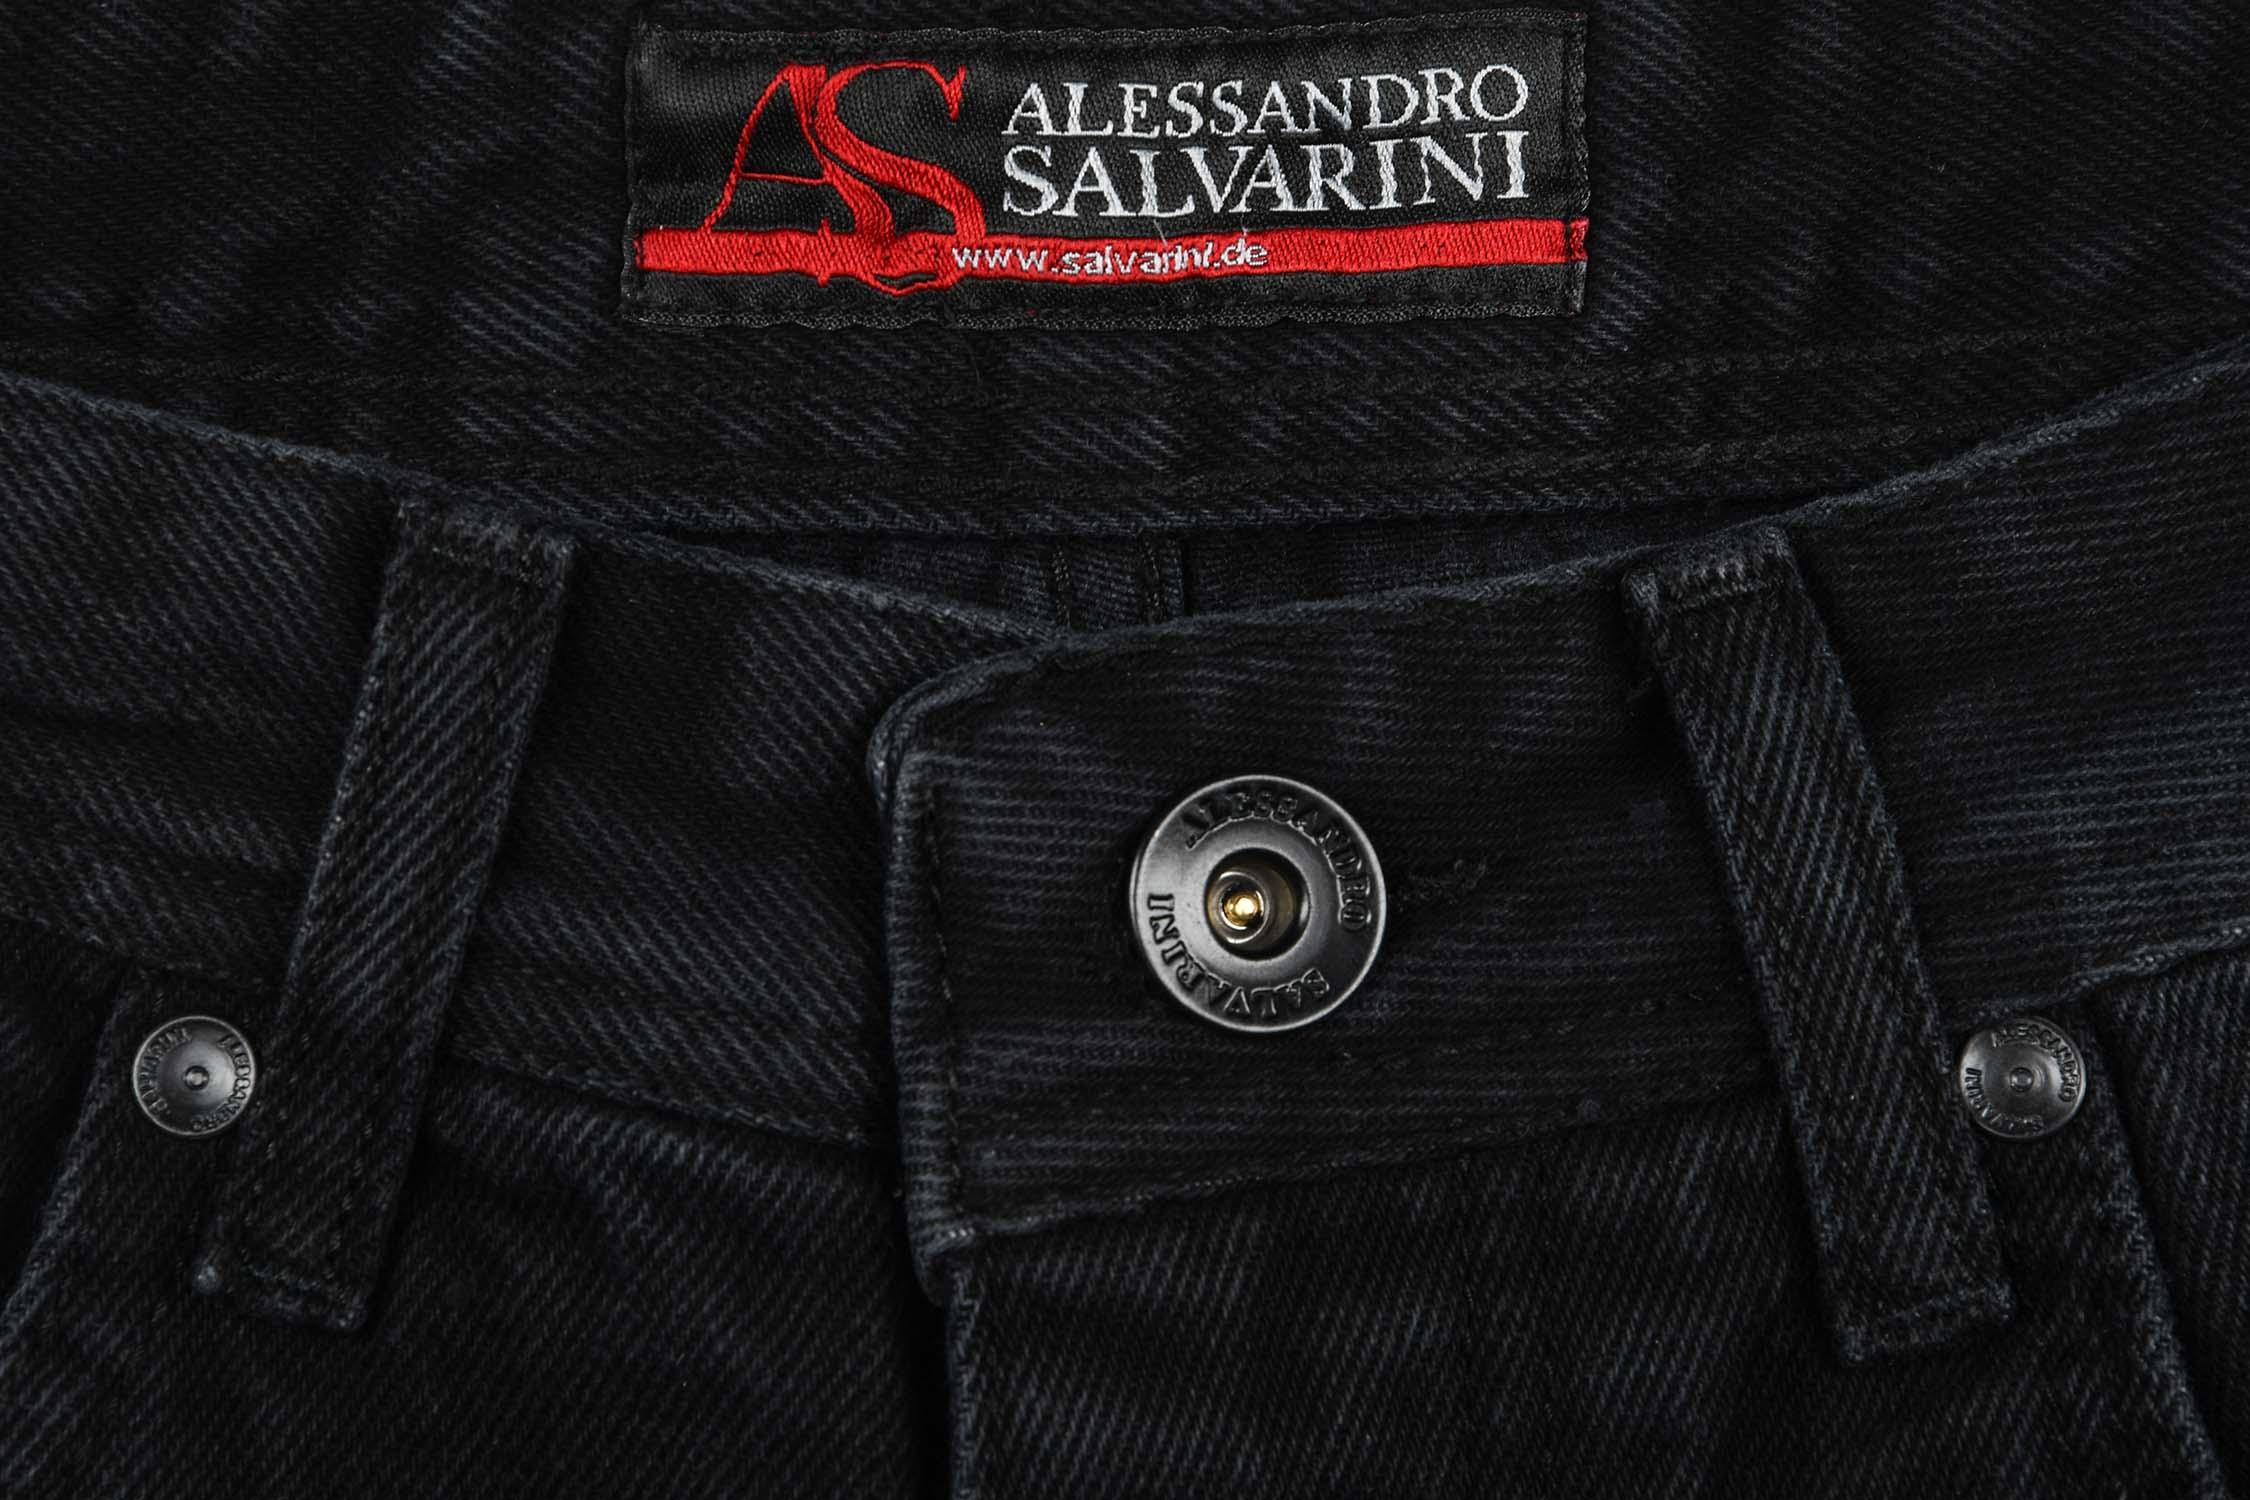 A-Salvarini-Designer-Herren-Jeans-Short-kurze-Sommer-Hose-Jeansshorts-Bermuda Indexbild 29